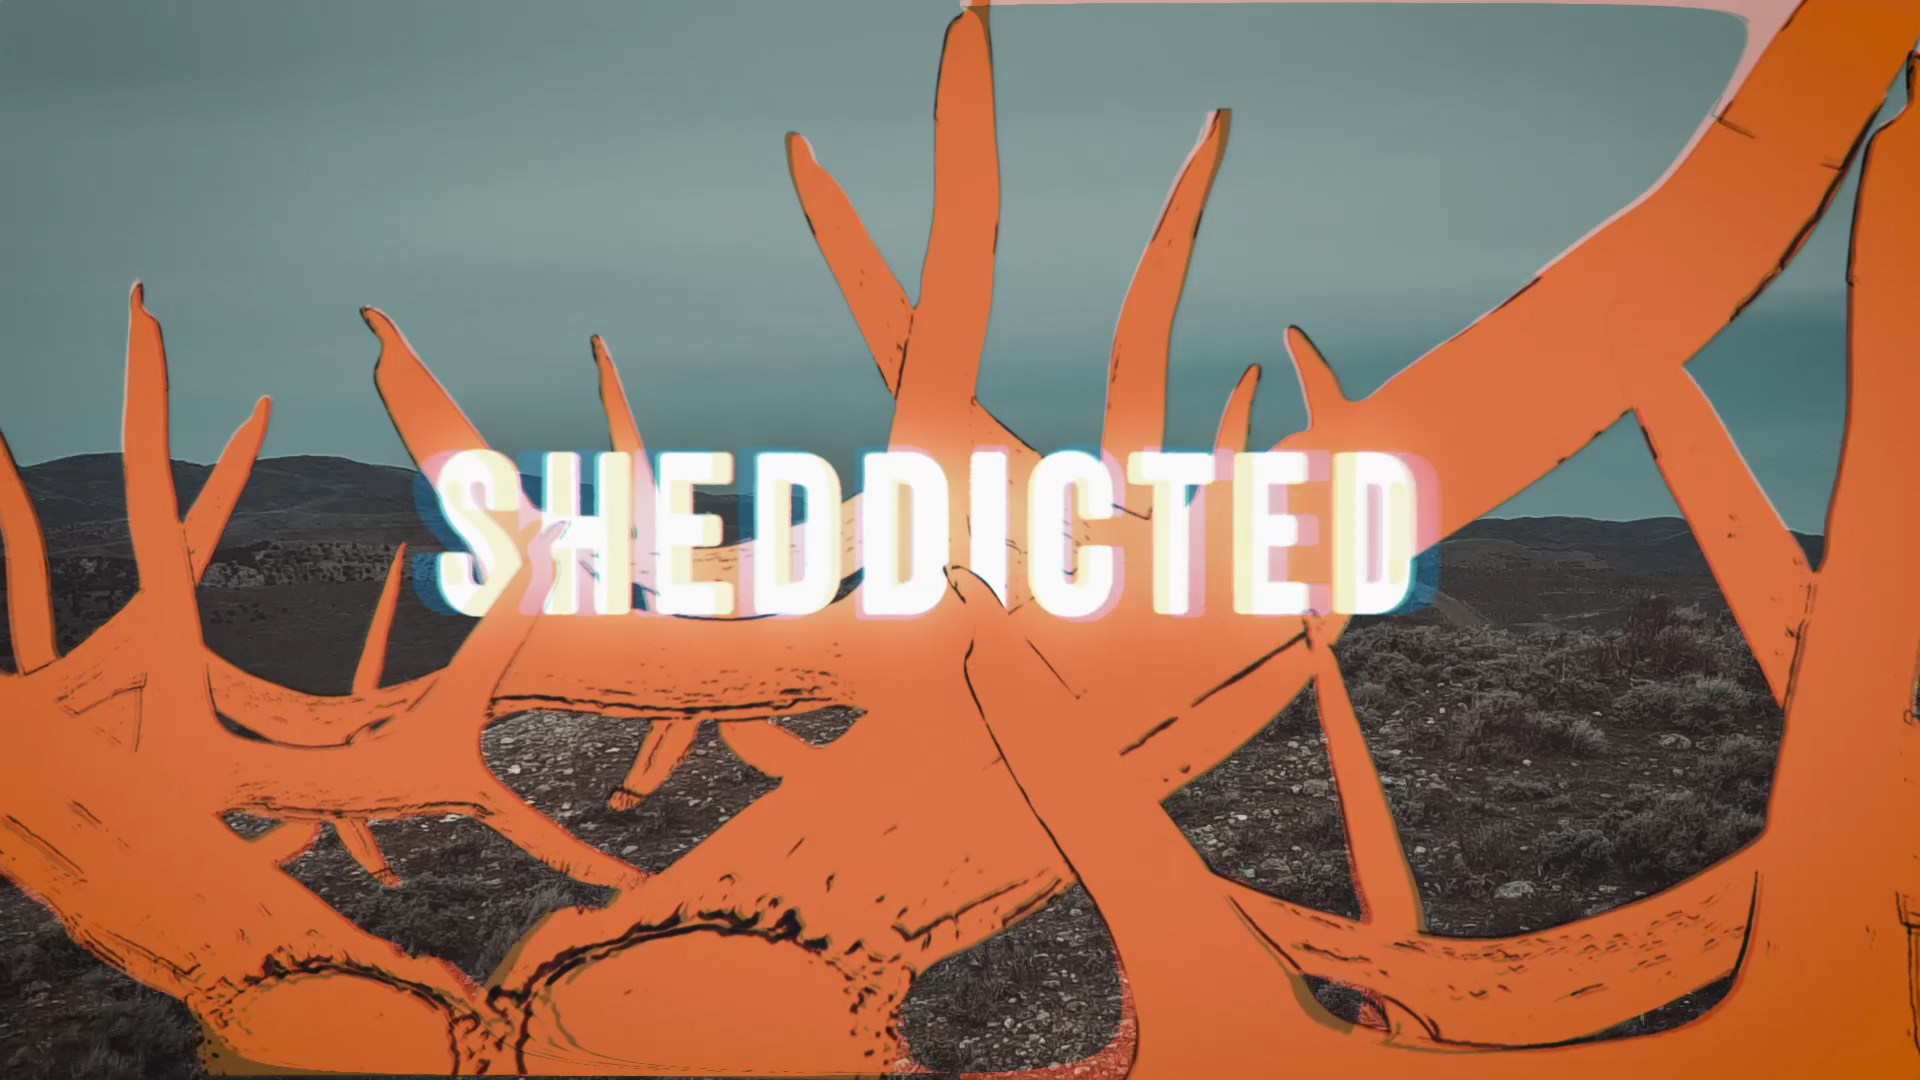 Sheddicted